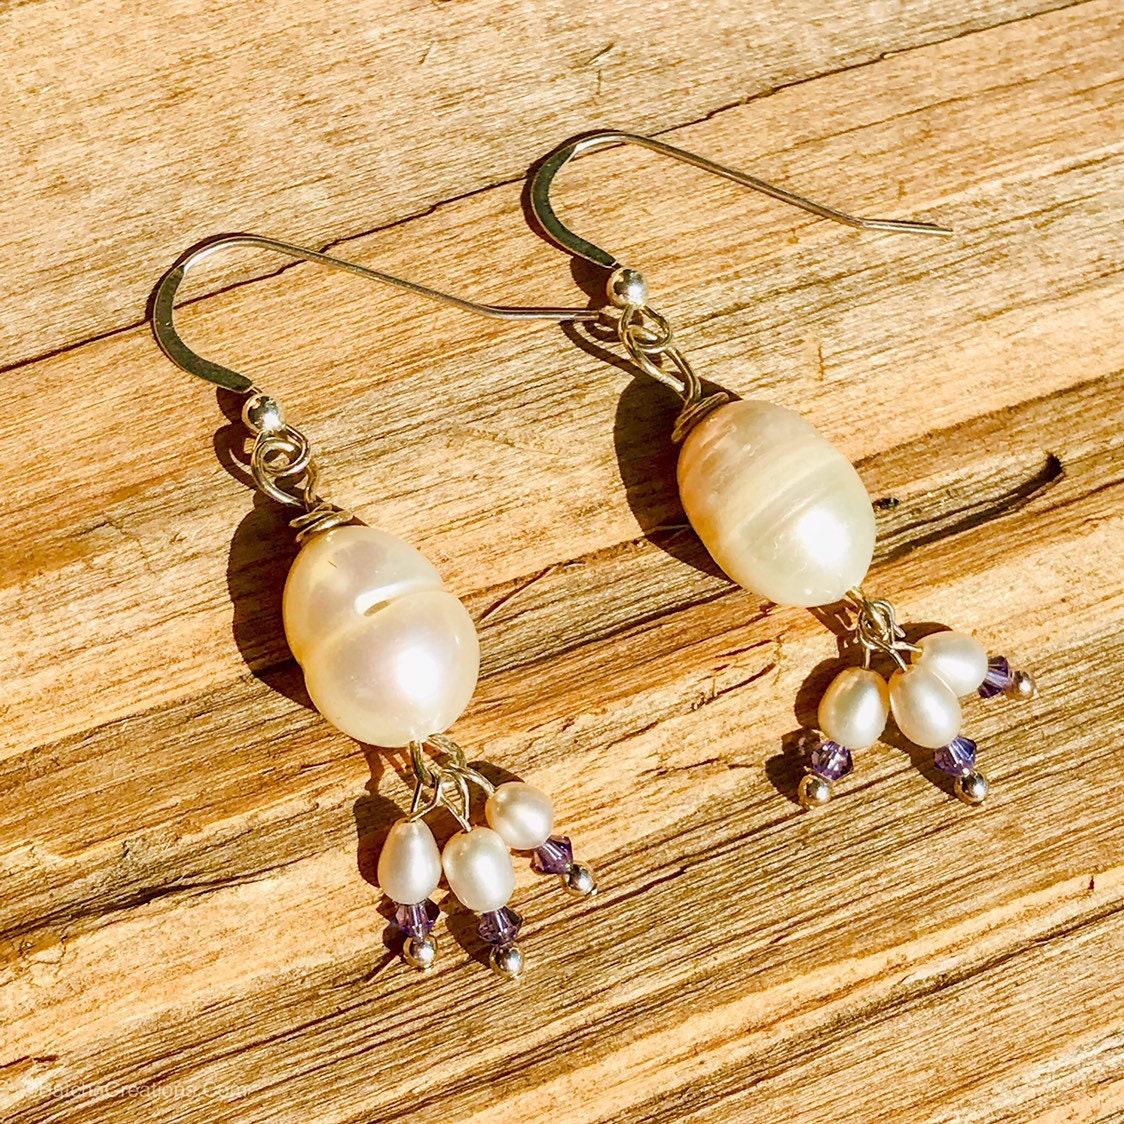 Pearl Tanzanite: Pearl & Tanzanite Earrings In Sterling Silver